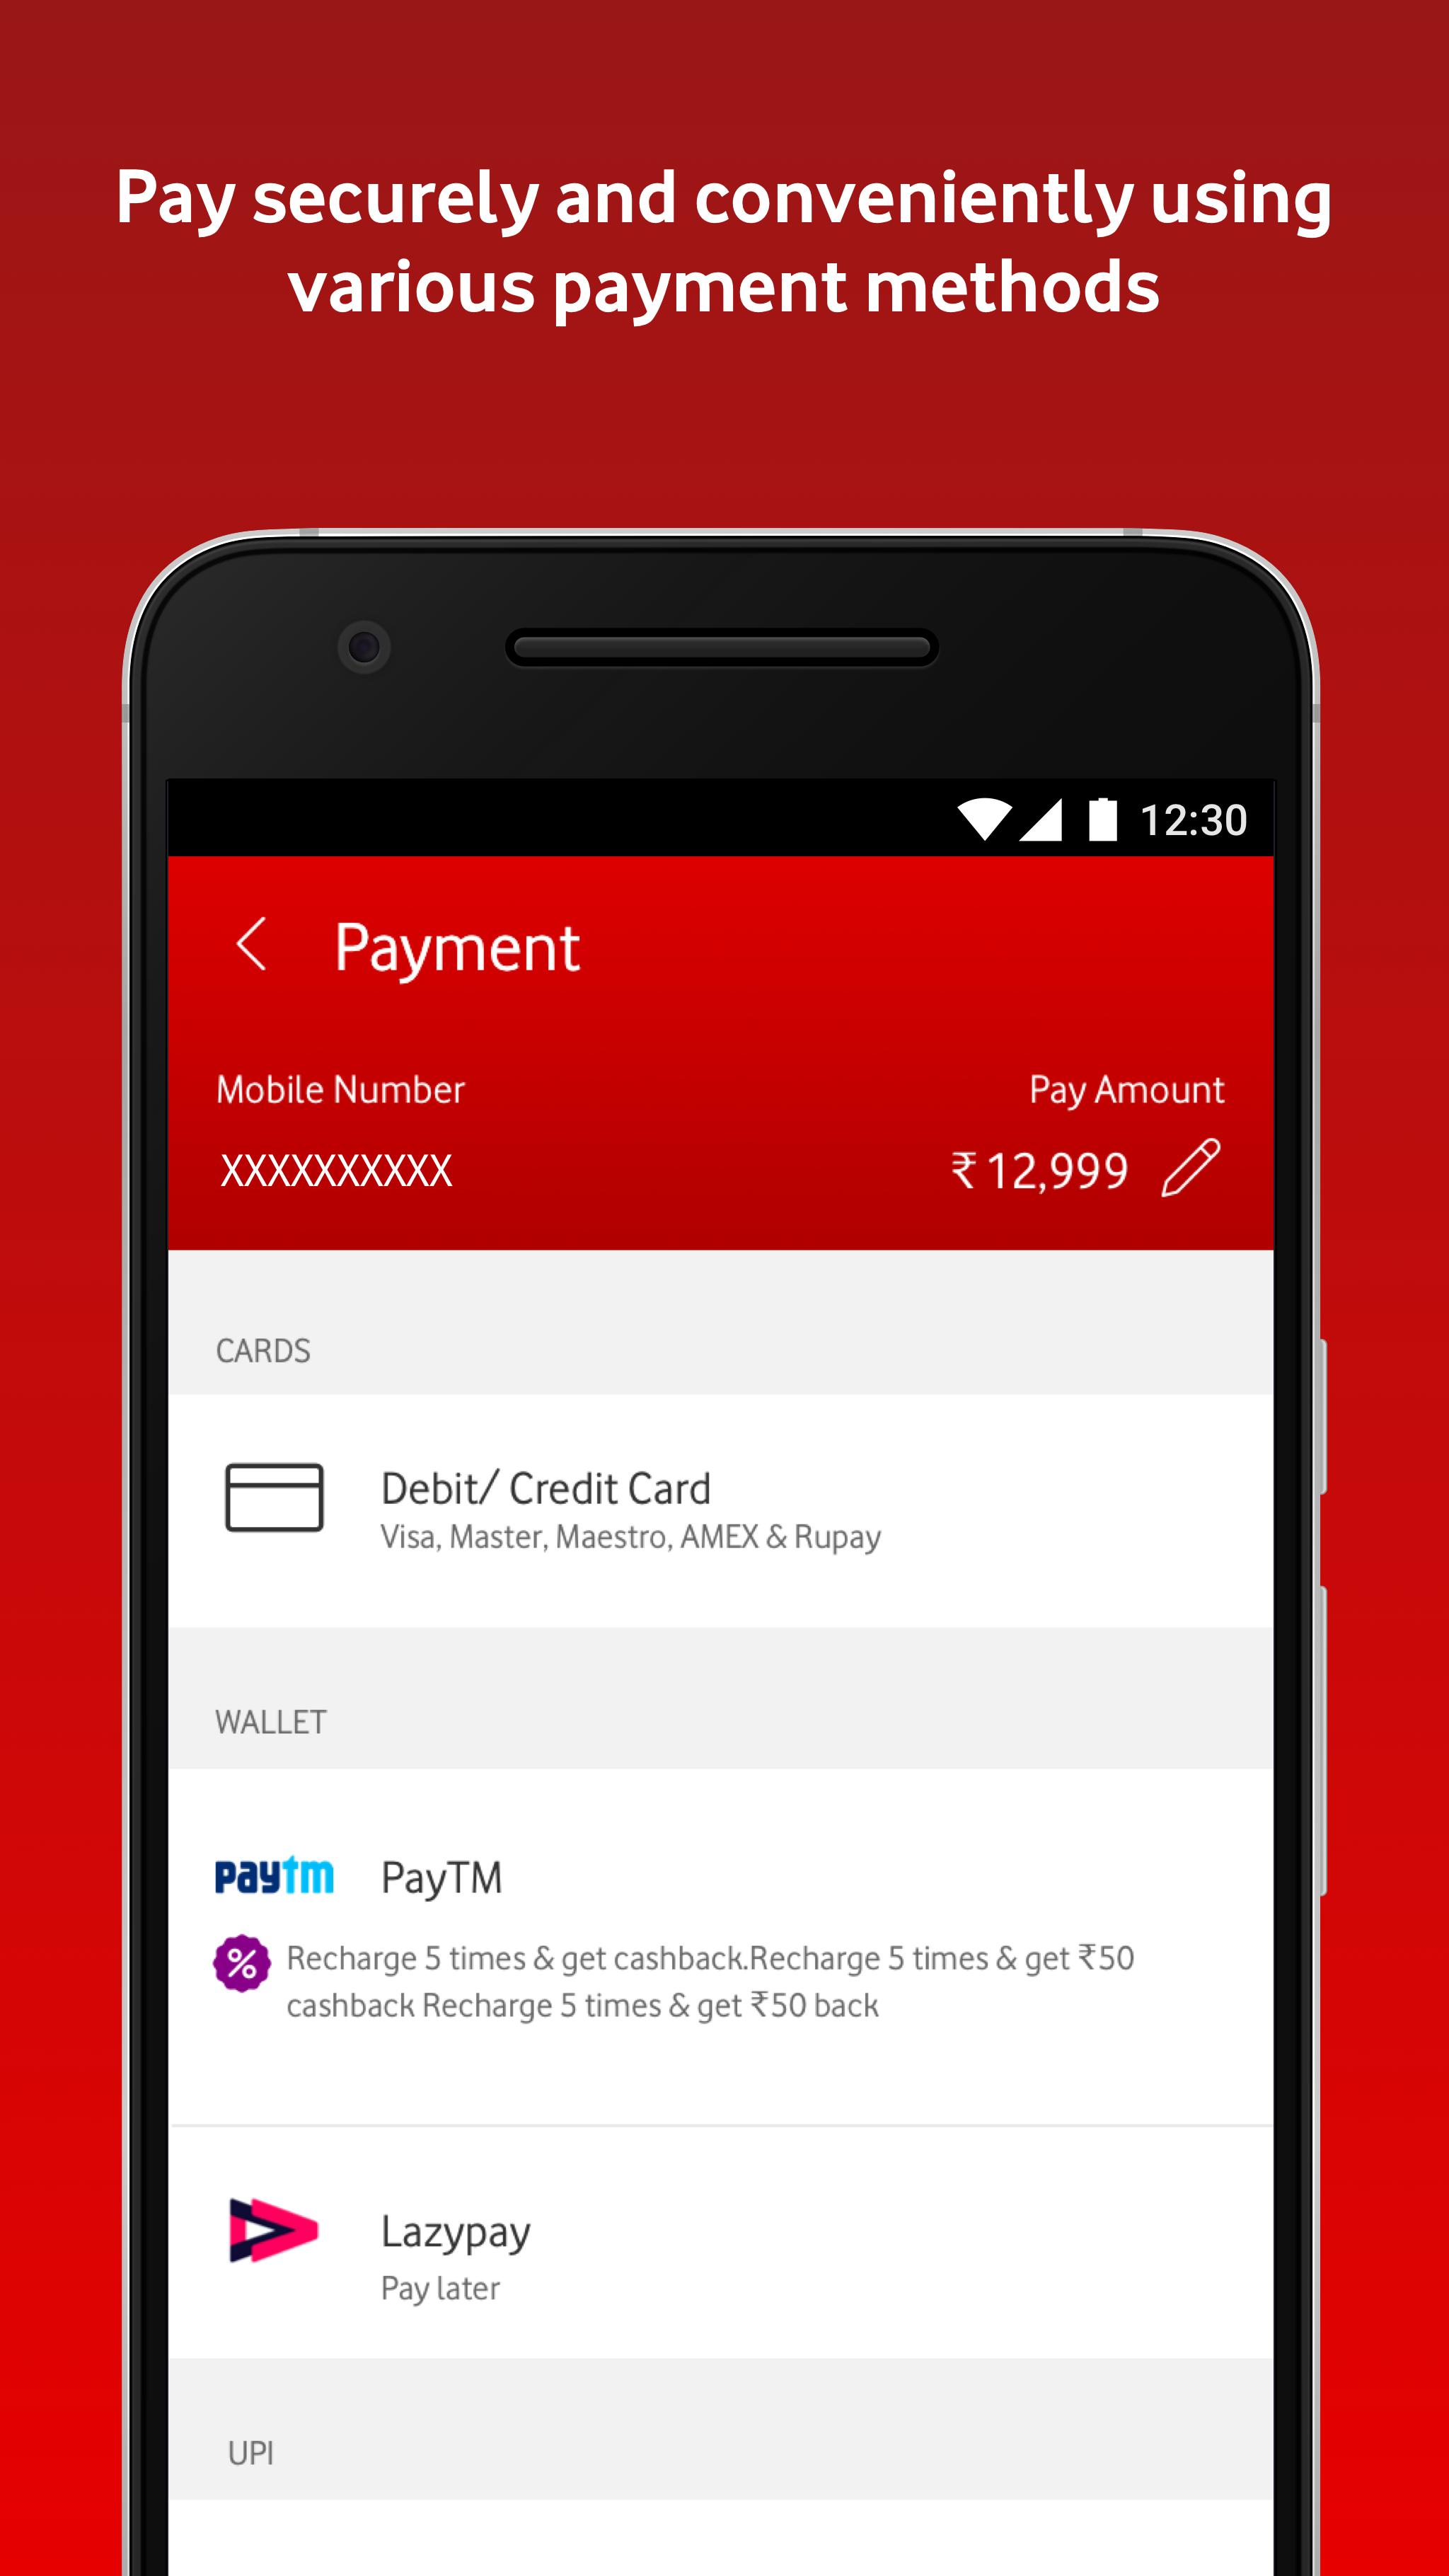 MyVodafone (India) - Online Recharge & Pay Bills 8.0.3.1 Screenshot 4